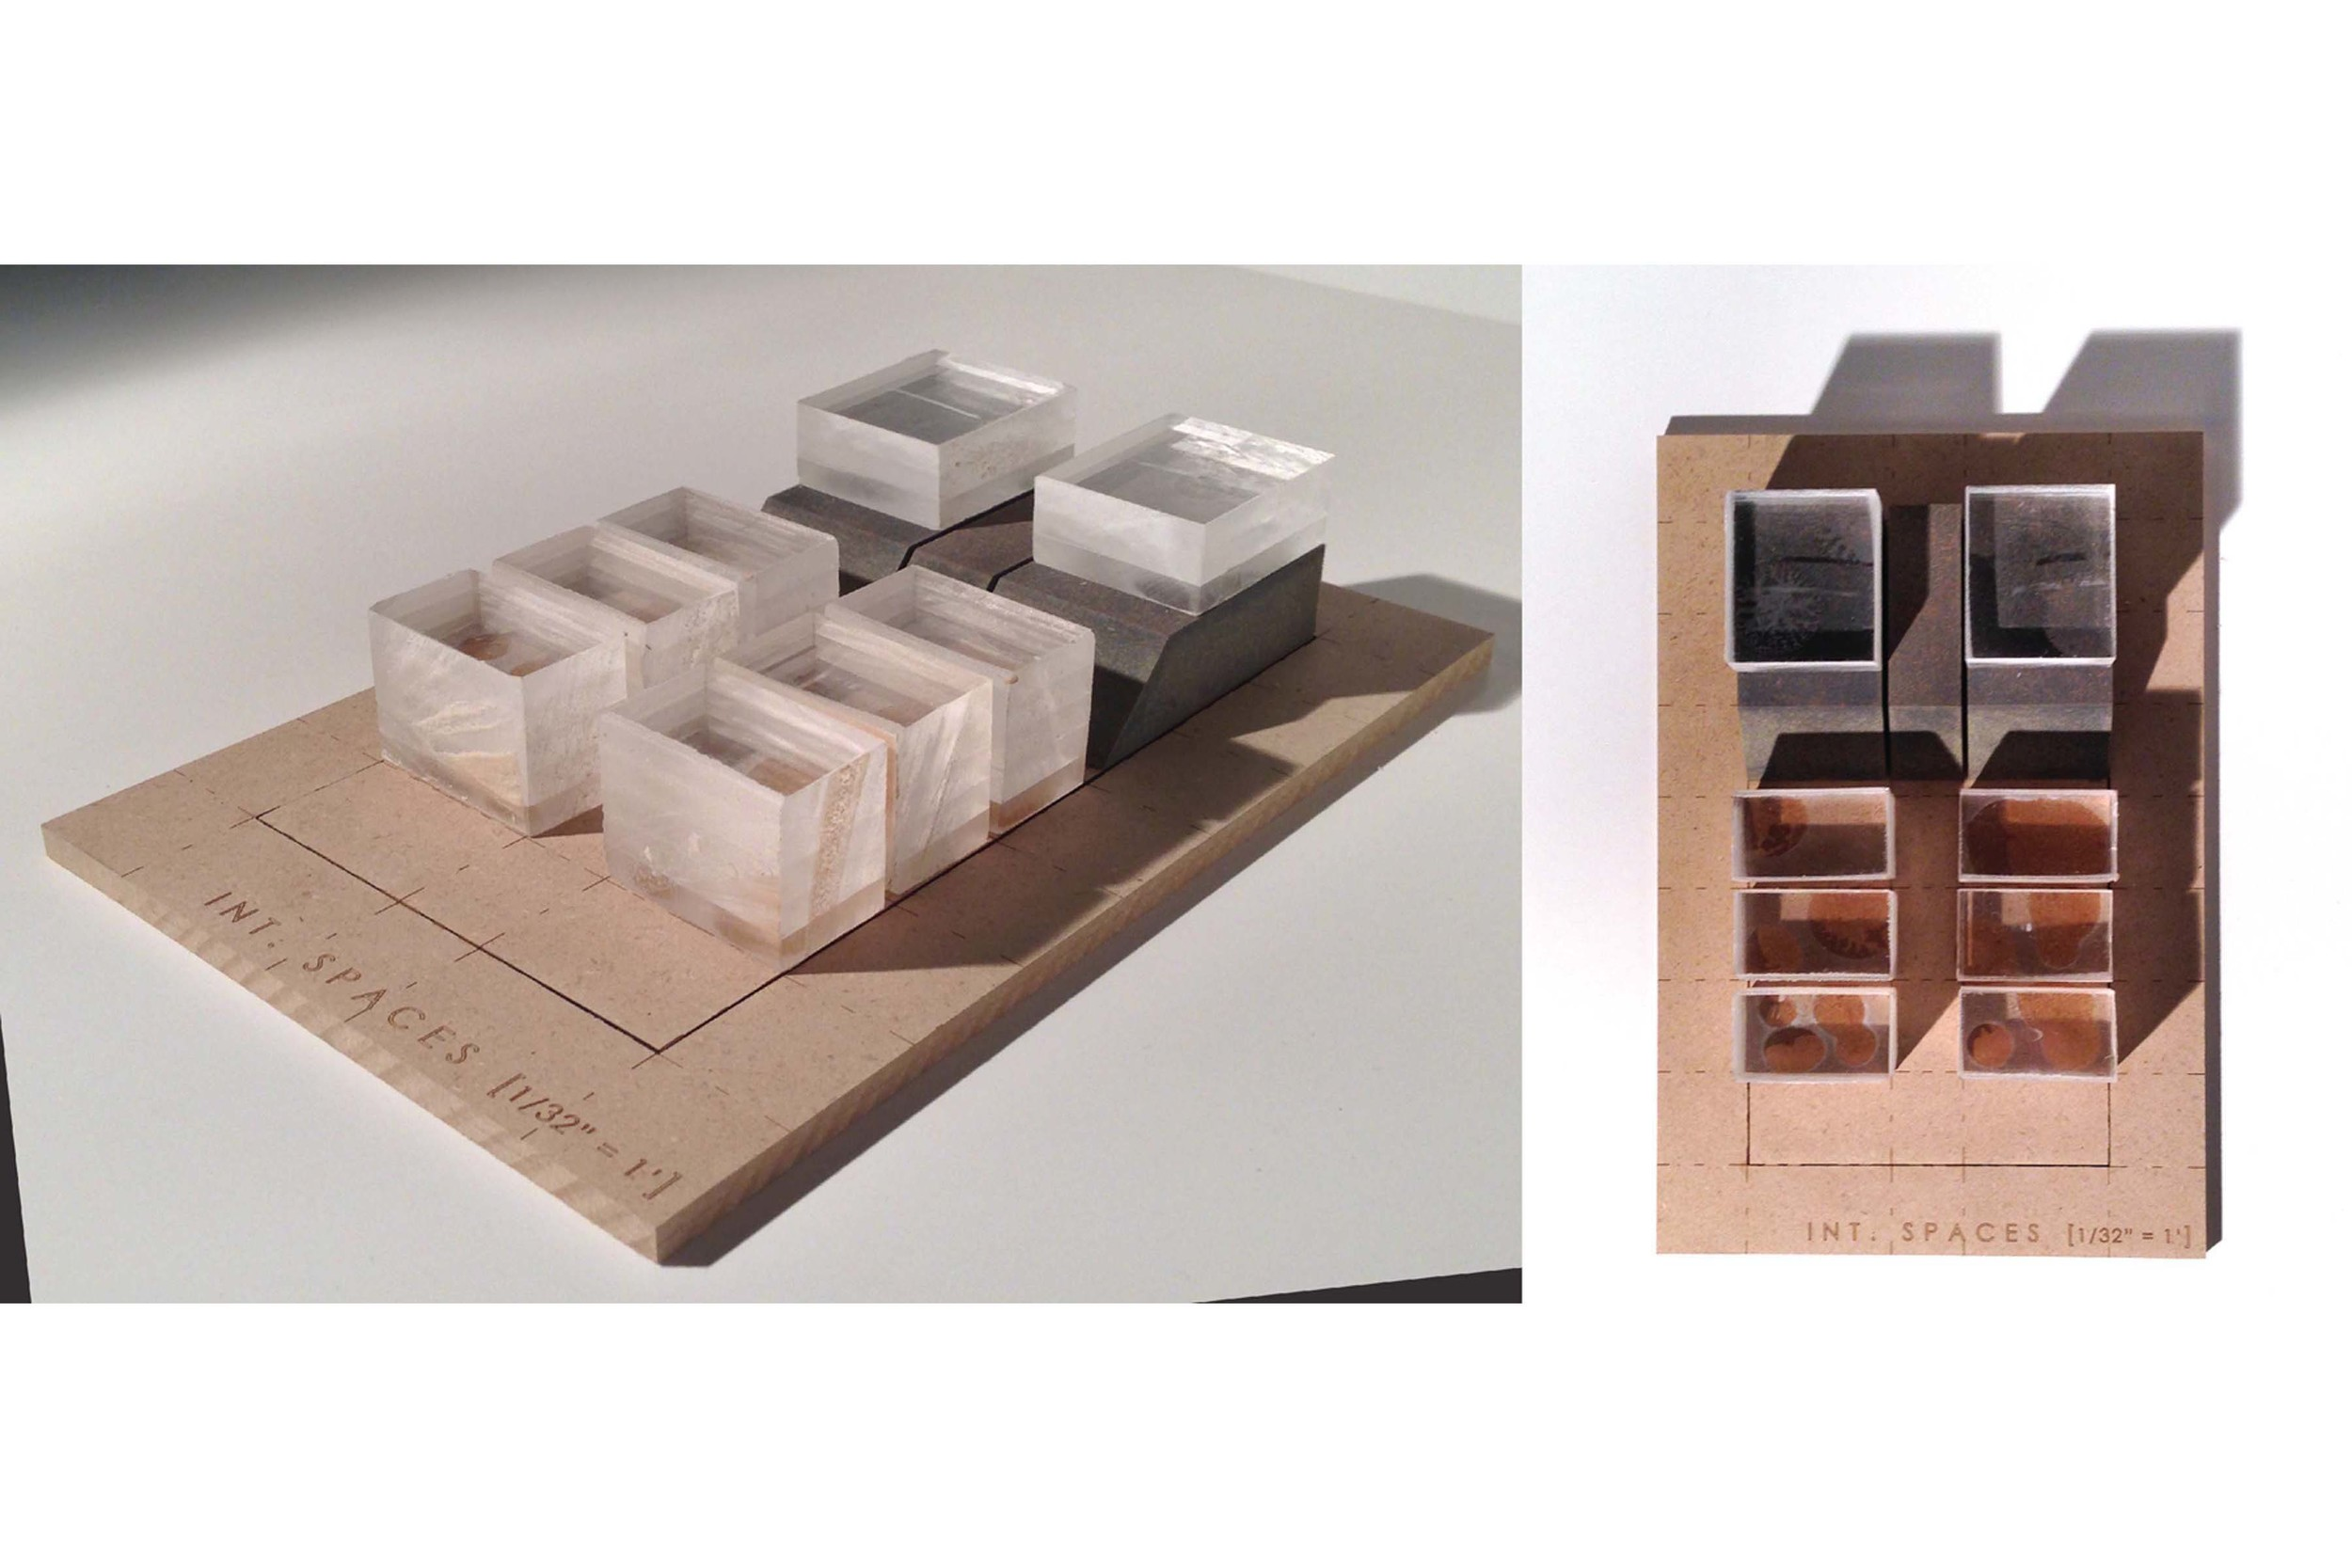 Concept Model: Volume